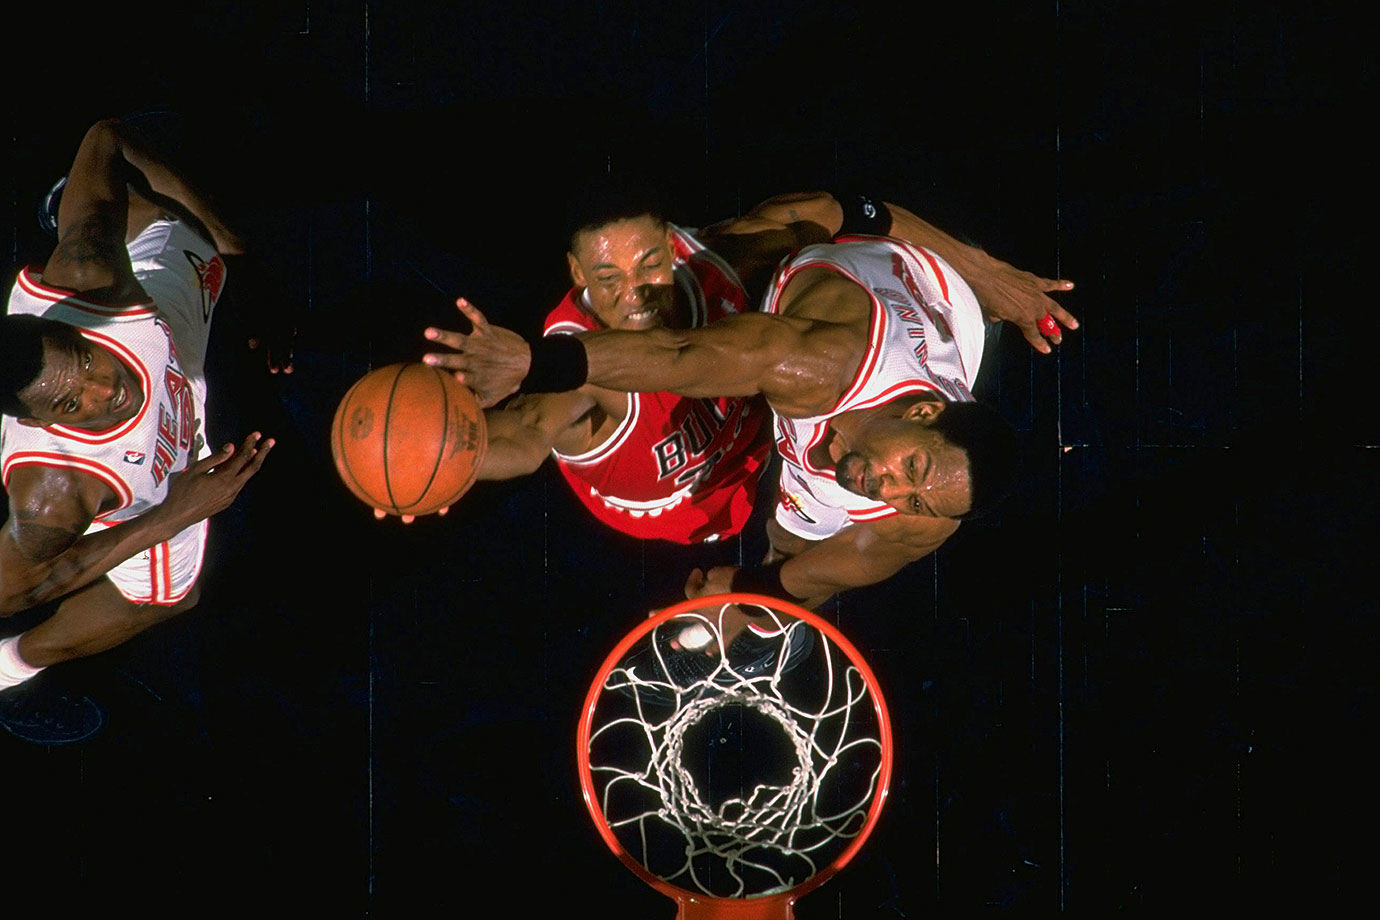 Feb. 23, 1996